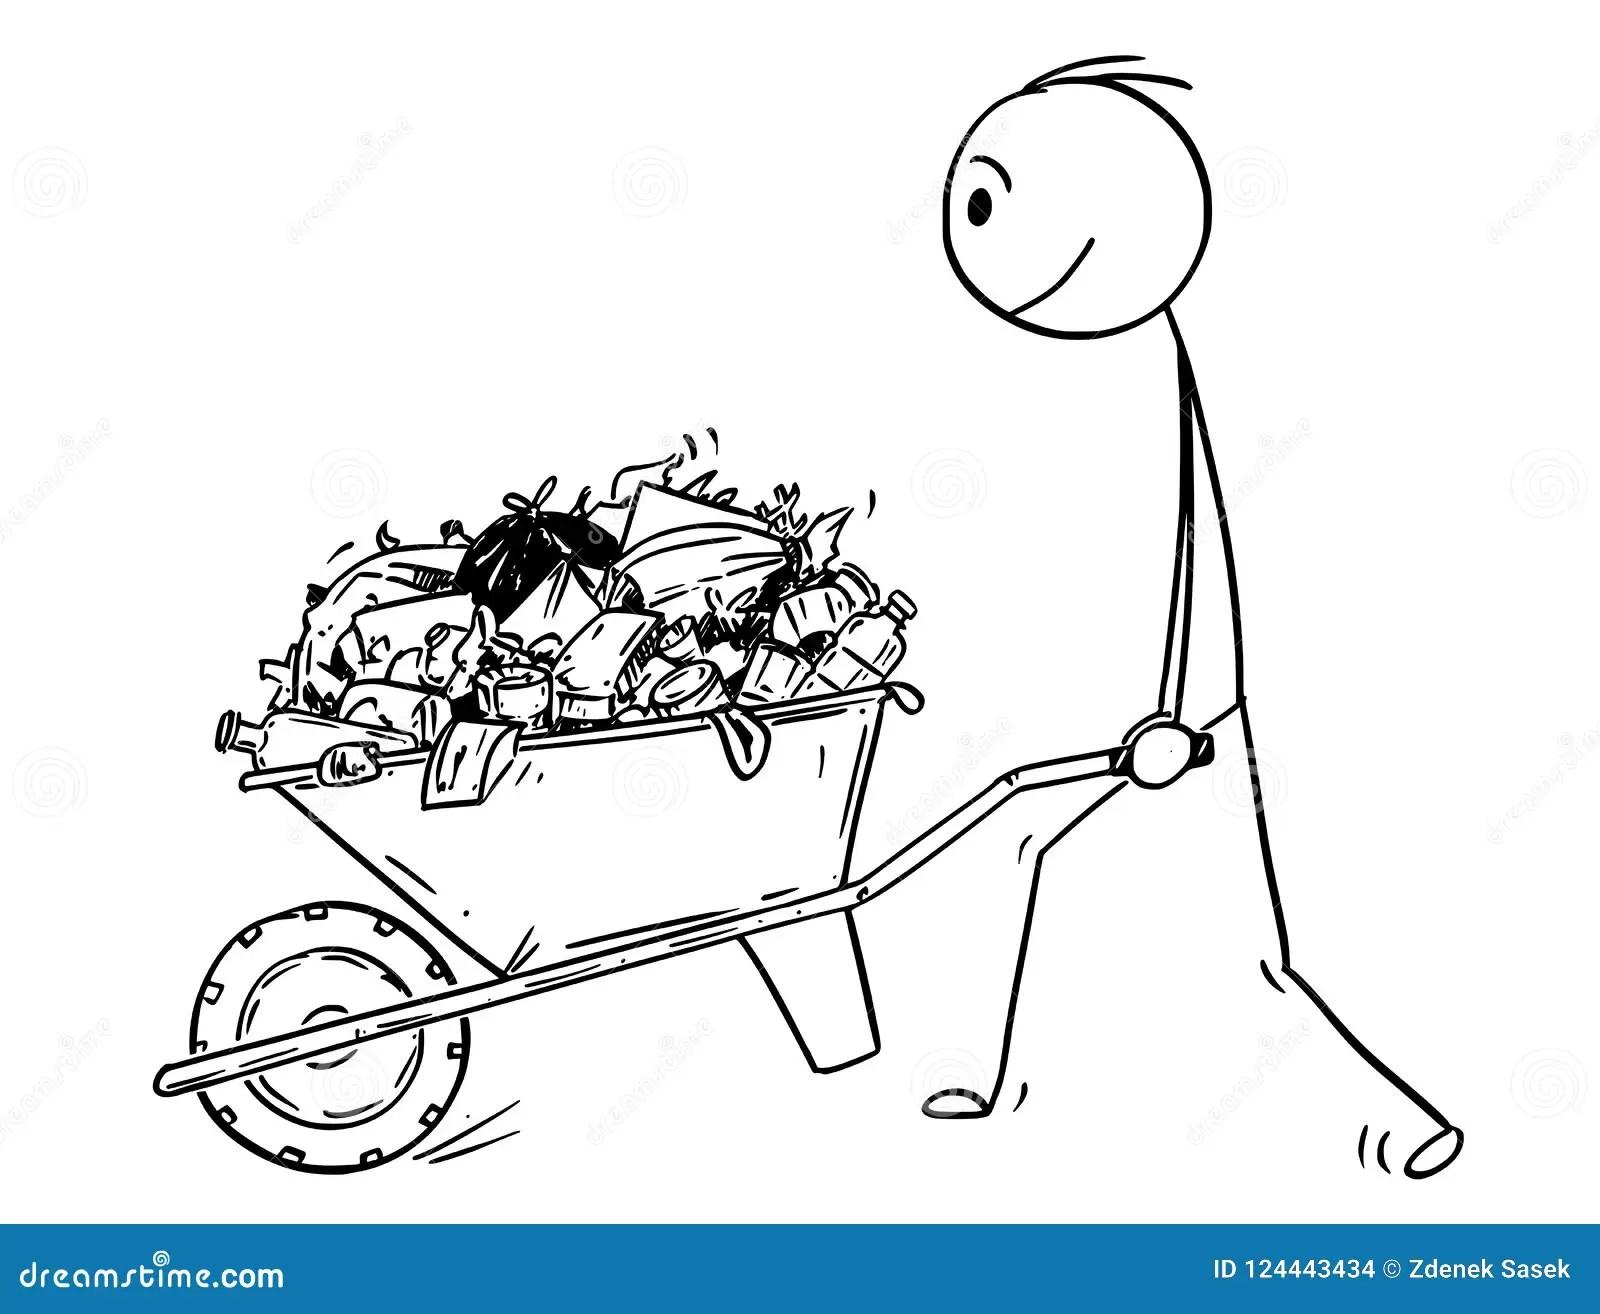 Cartoon Man Pushing Wheelbarrow Stock Illustrations 130